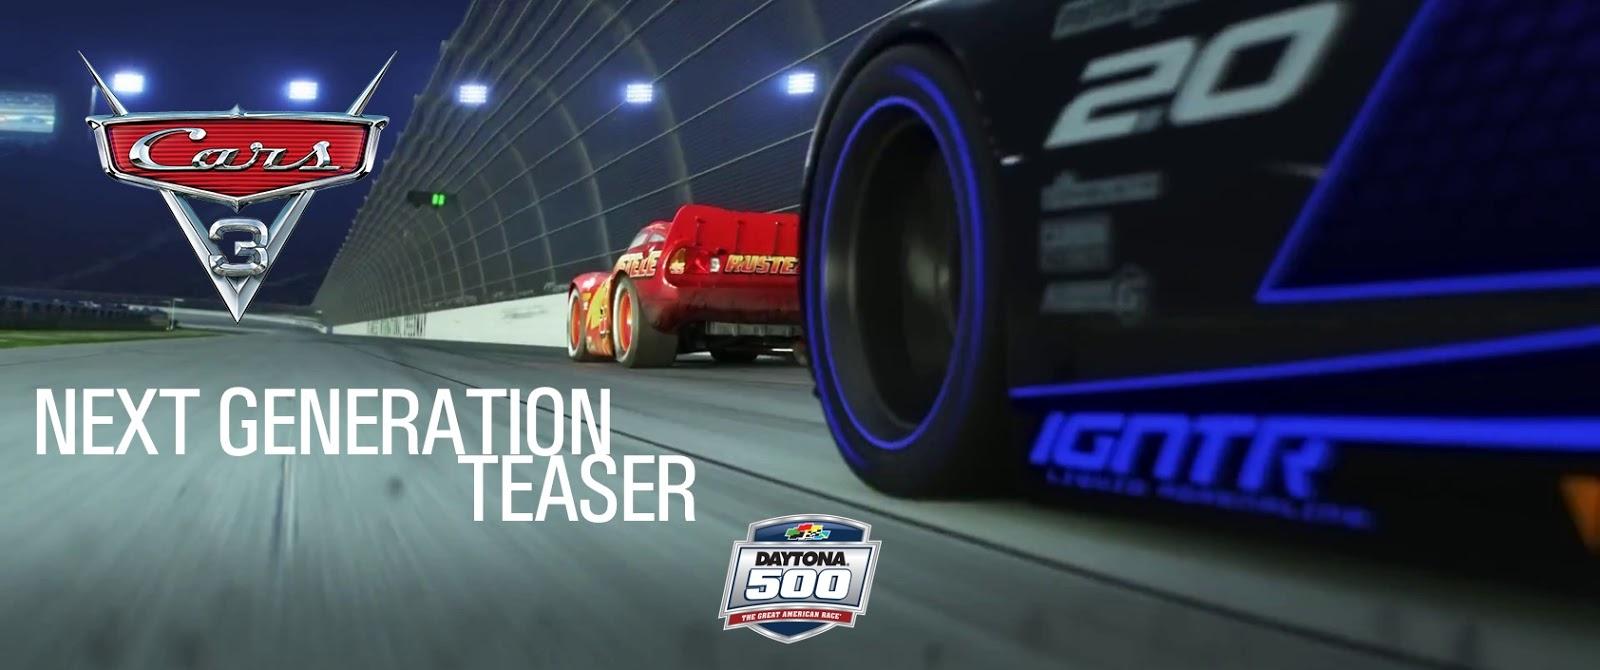 "Suspenseful ""Next Generation"" Cars 3 Teaser Premieres ..."